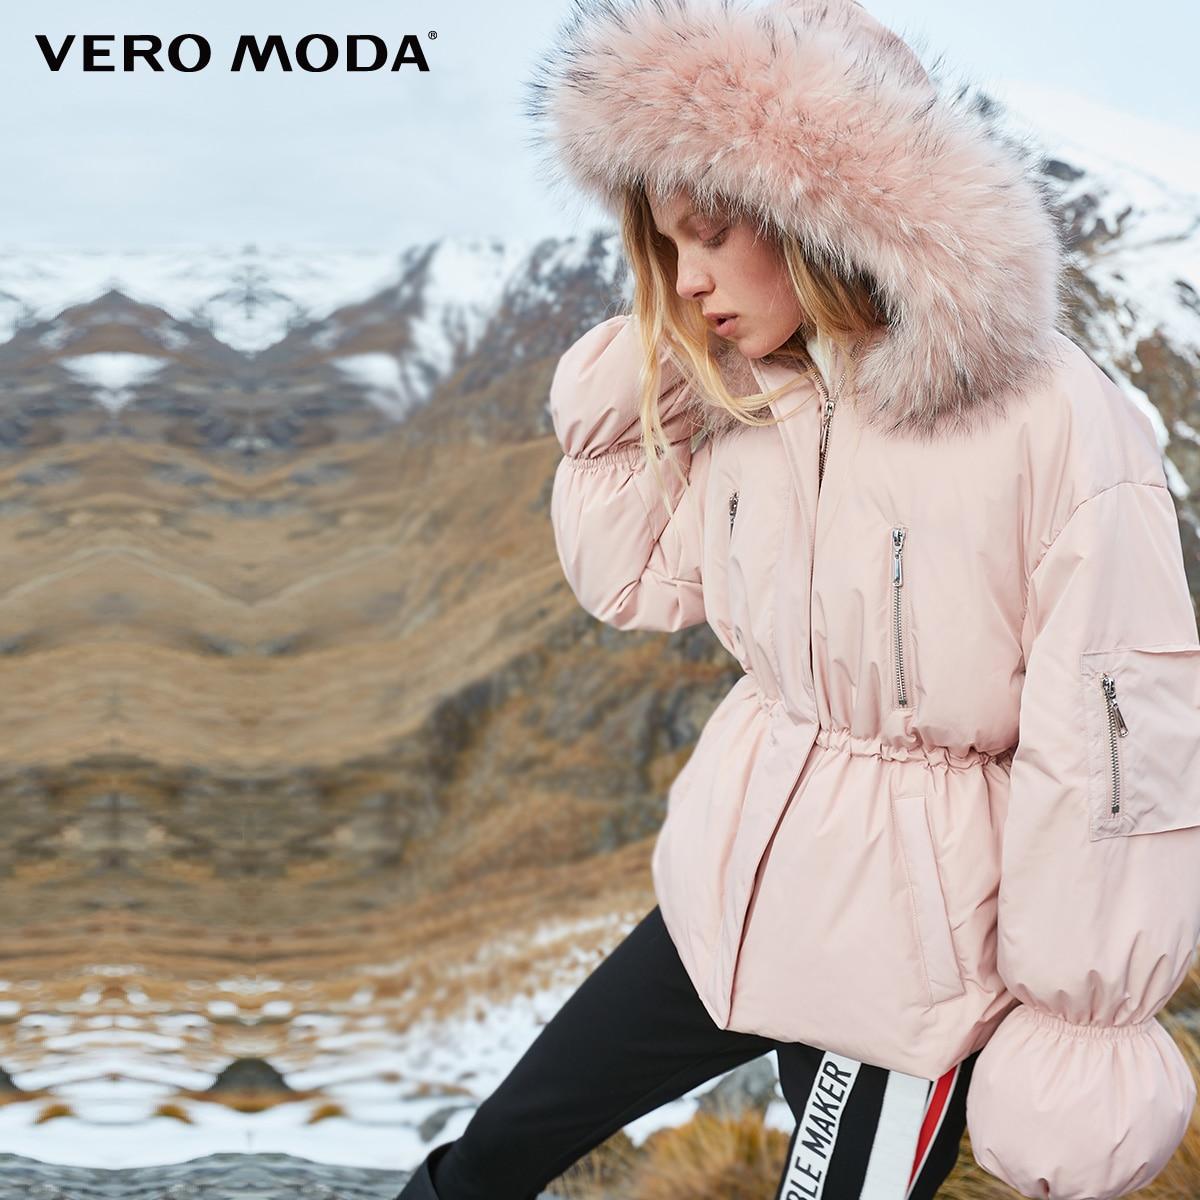 Vero Moda Women's New Hooded  Bell Sleeve Down Jacket Parka Coat | 318423511